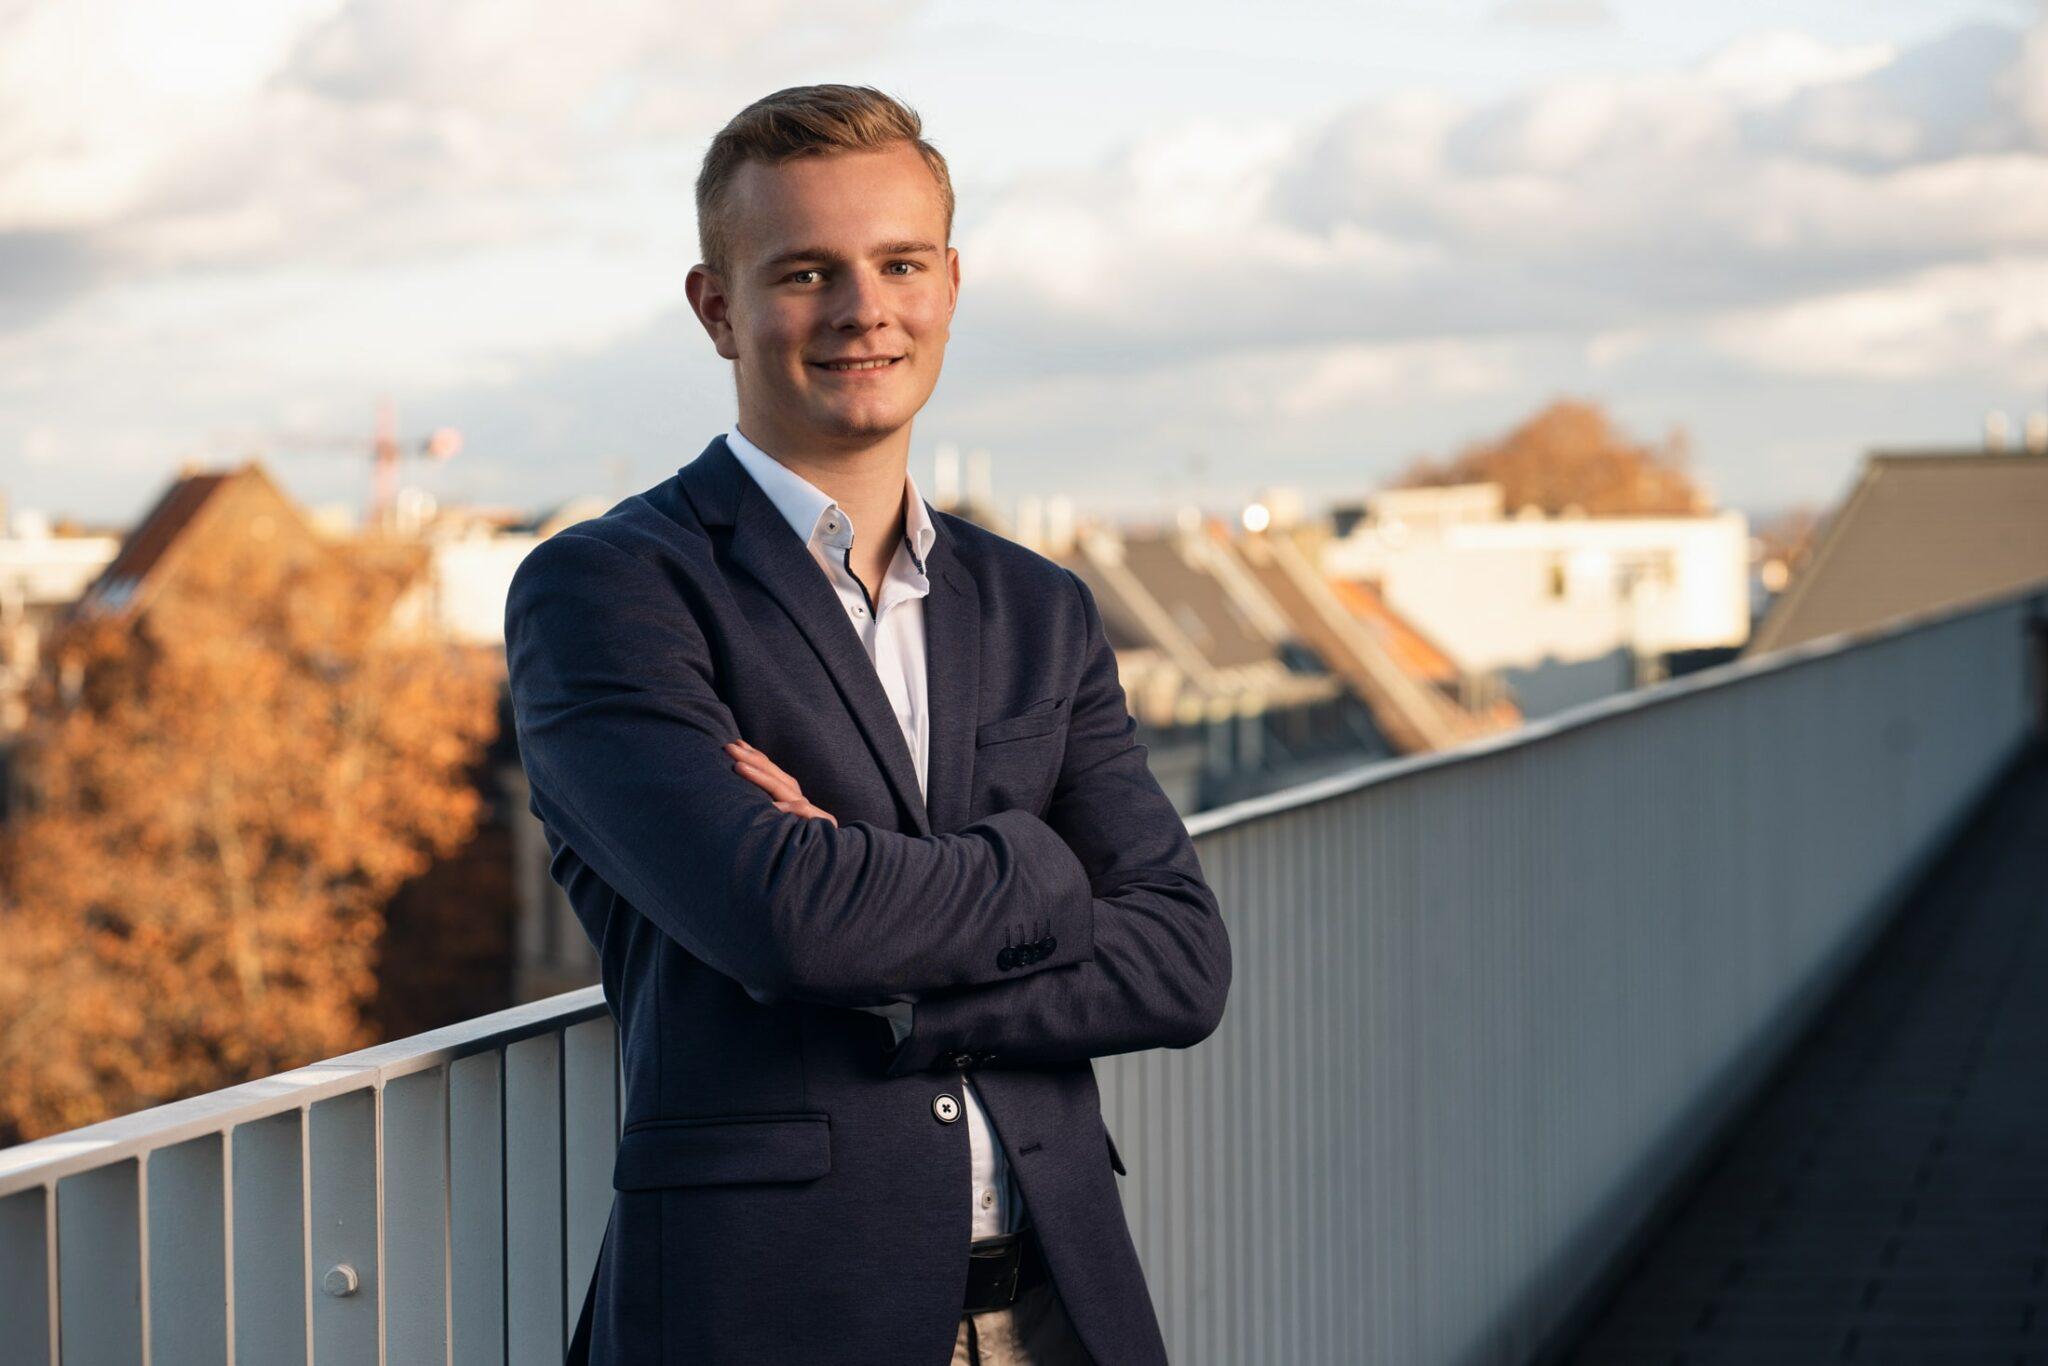 Finn Peiter-Geschäftsführer-NetVantage-Marketing-Köln